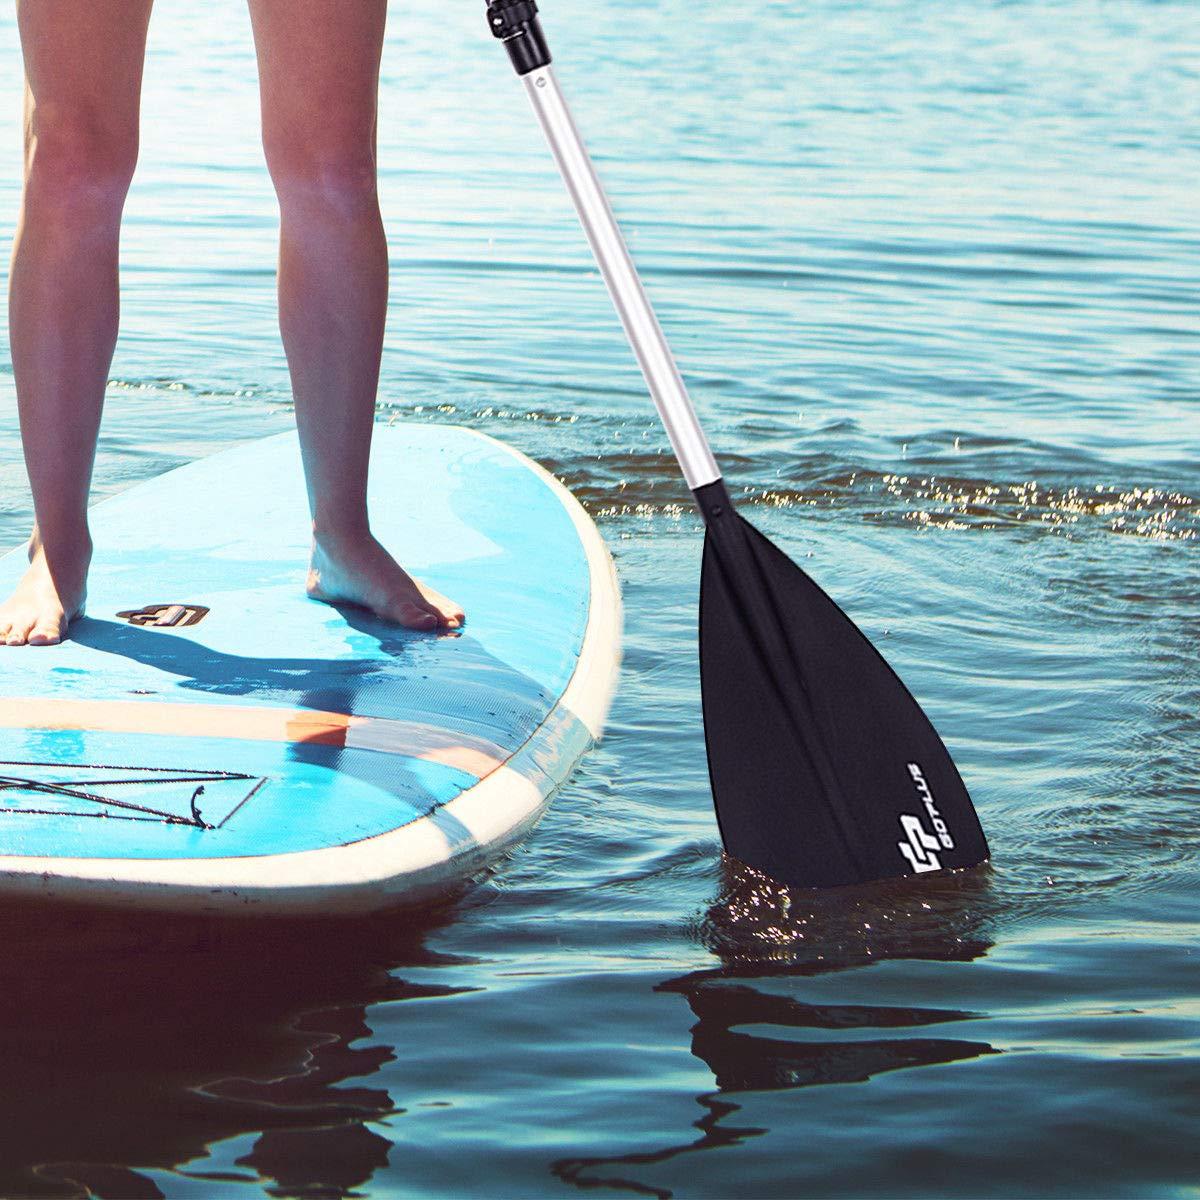 Amazon.com : Goplus Adjustable Surf & SUP Paddle 3-Piece Aluminum Alloy Stand Up Paddleboard Paddle Blcak : Sports & Outdoors